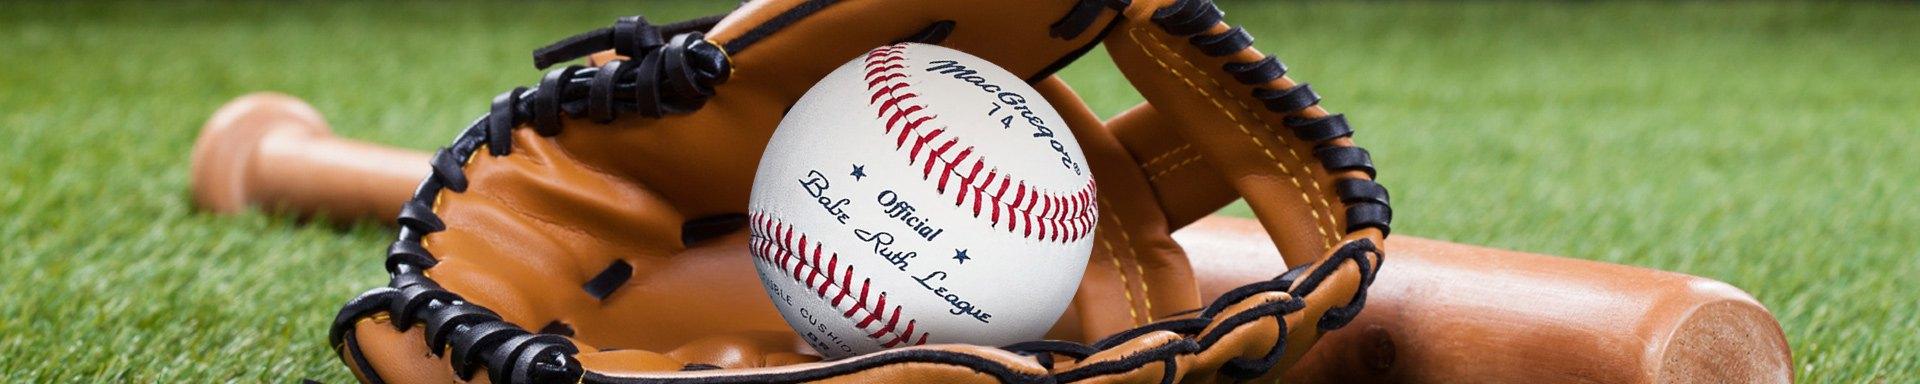 MACGREGOR Baseball Home Plate Brush Black